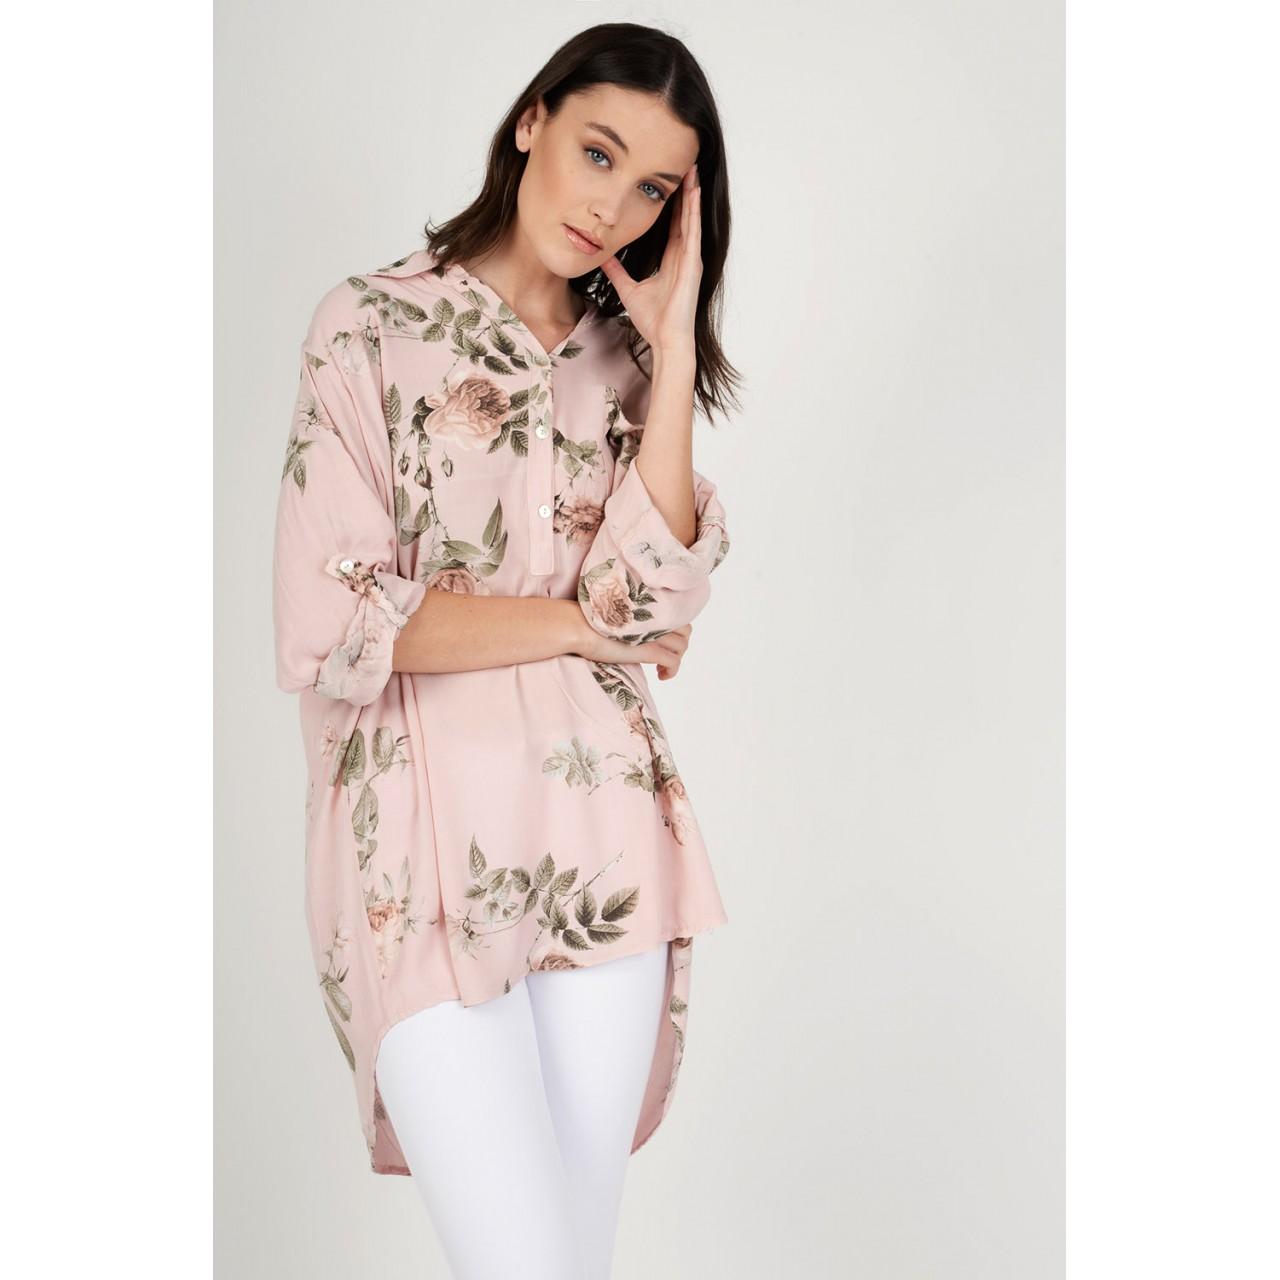 3c87dbff4f6a Oversized πουκαμίσα floral